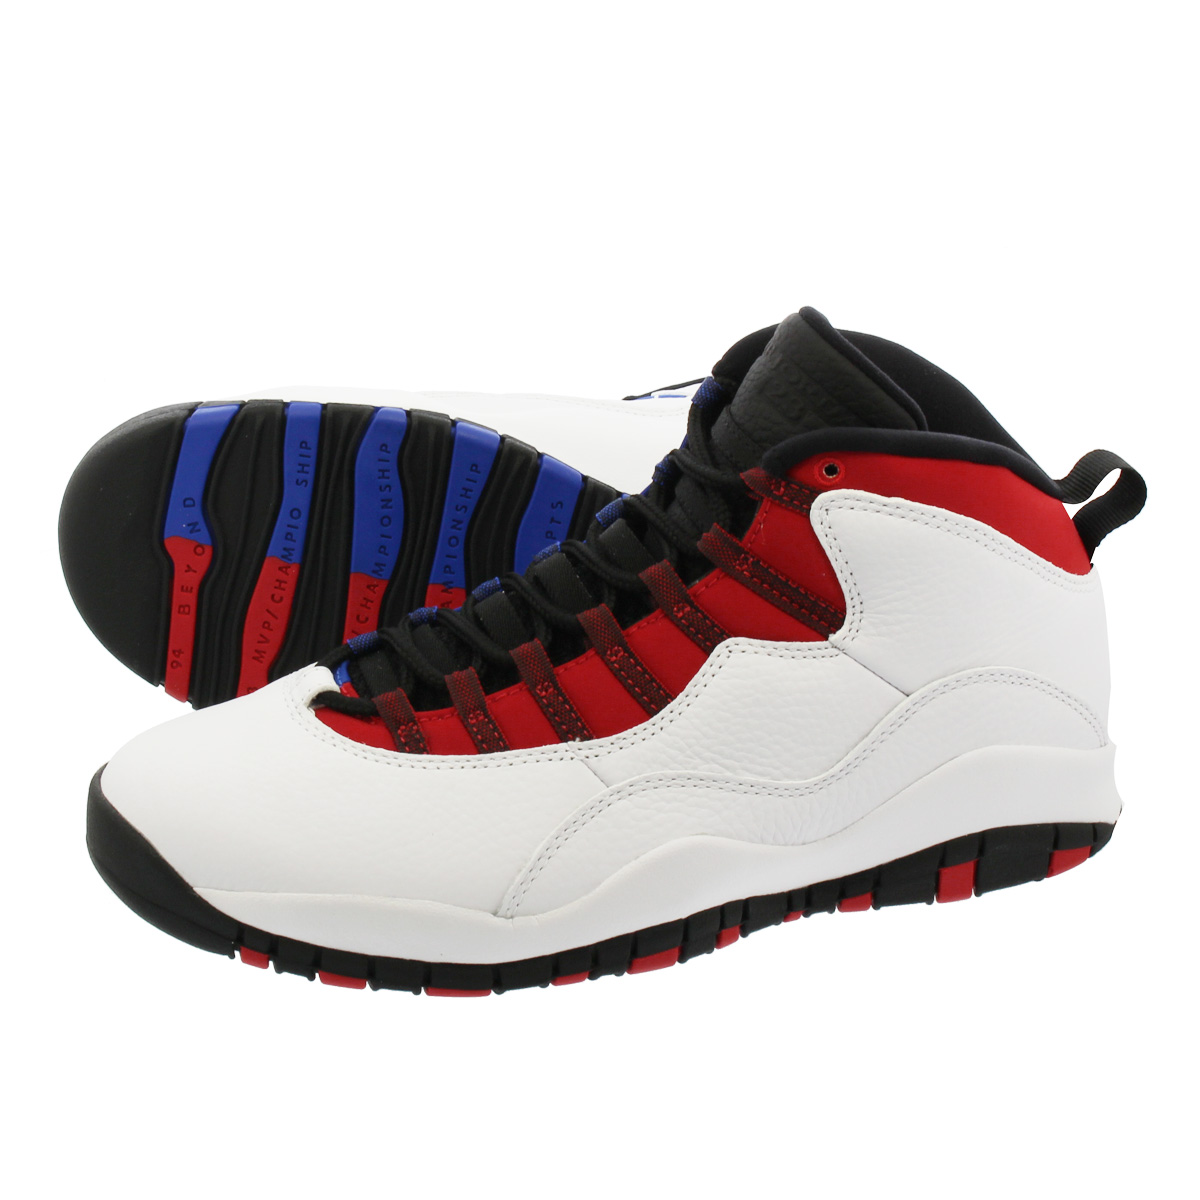 purchase cheap c05e6 2ef67 NIKE AIR JORDAN 10 RETRO Nike Air Jordan 10 nostalgic  WHITE/BLACK/UNIVERSITY RED/HYPER ROYAL 310,805-160